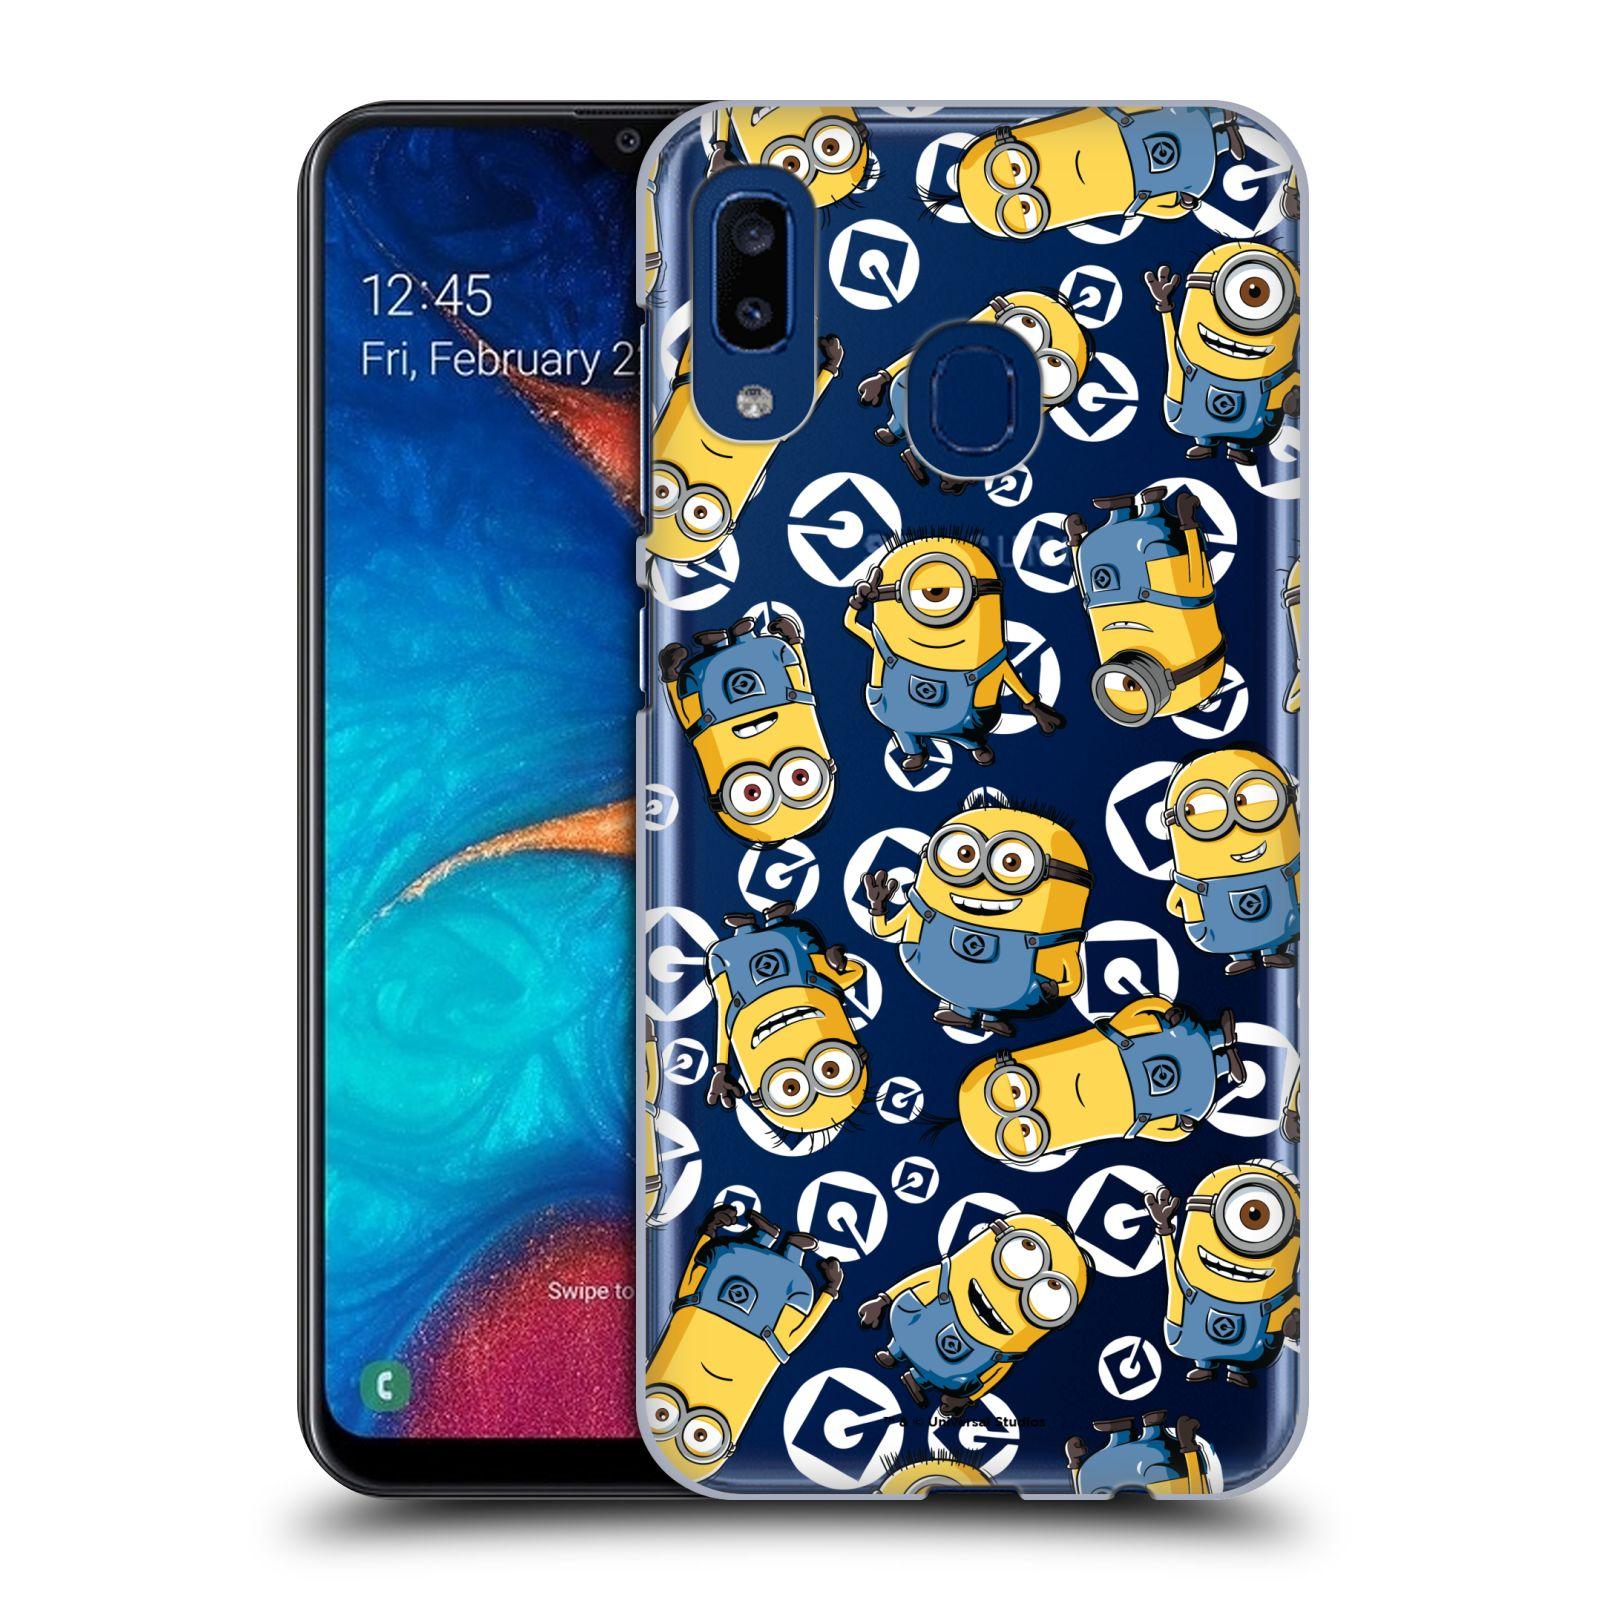 Plastové pouzdro na mobil Samsung Galaxy A20 - Head Case - Minion pattern z filmu Já, padouch - Despicable Me